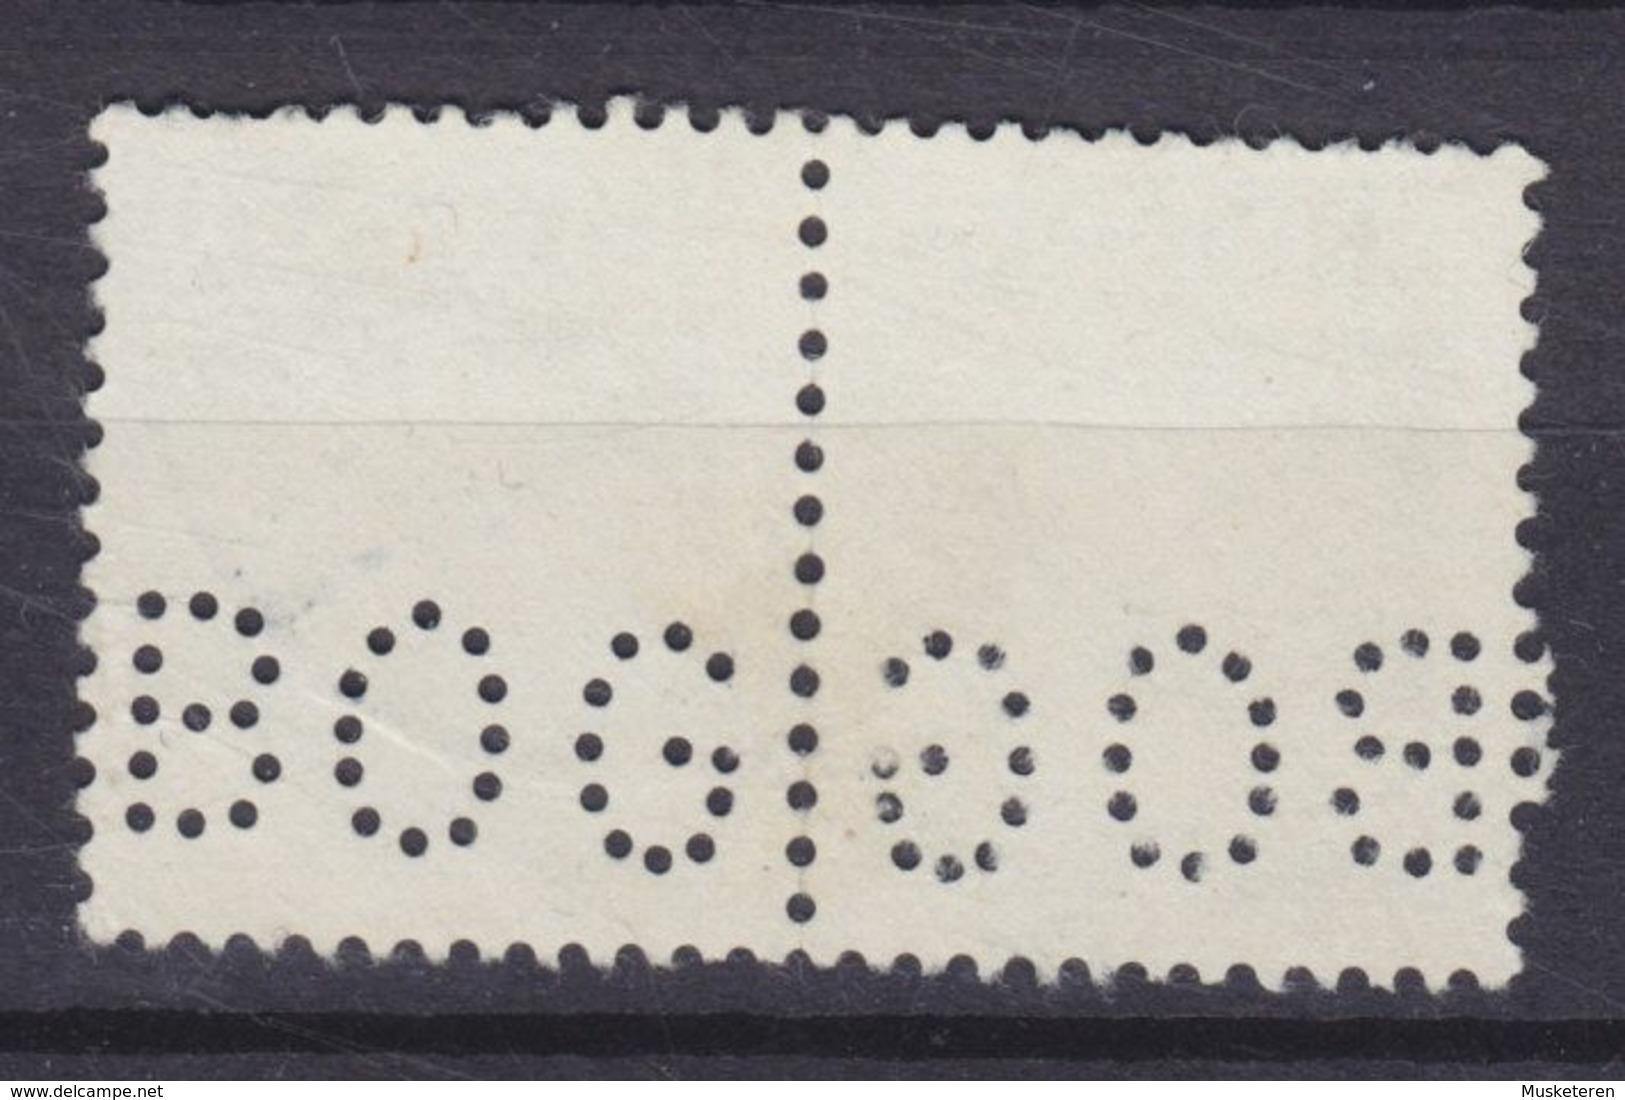 Denmark Perfin Perforé Lochung (B33) 'BOG' Boghallen, København Chr. X Pair Paare (2 Scans) - Errors, Freaks & Oddities (EFO)